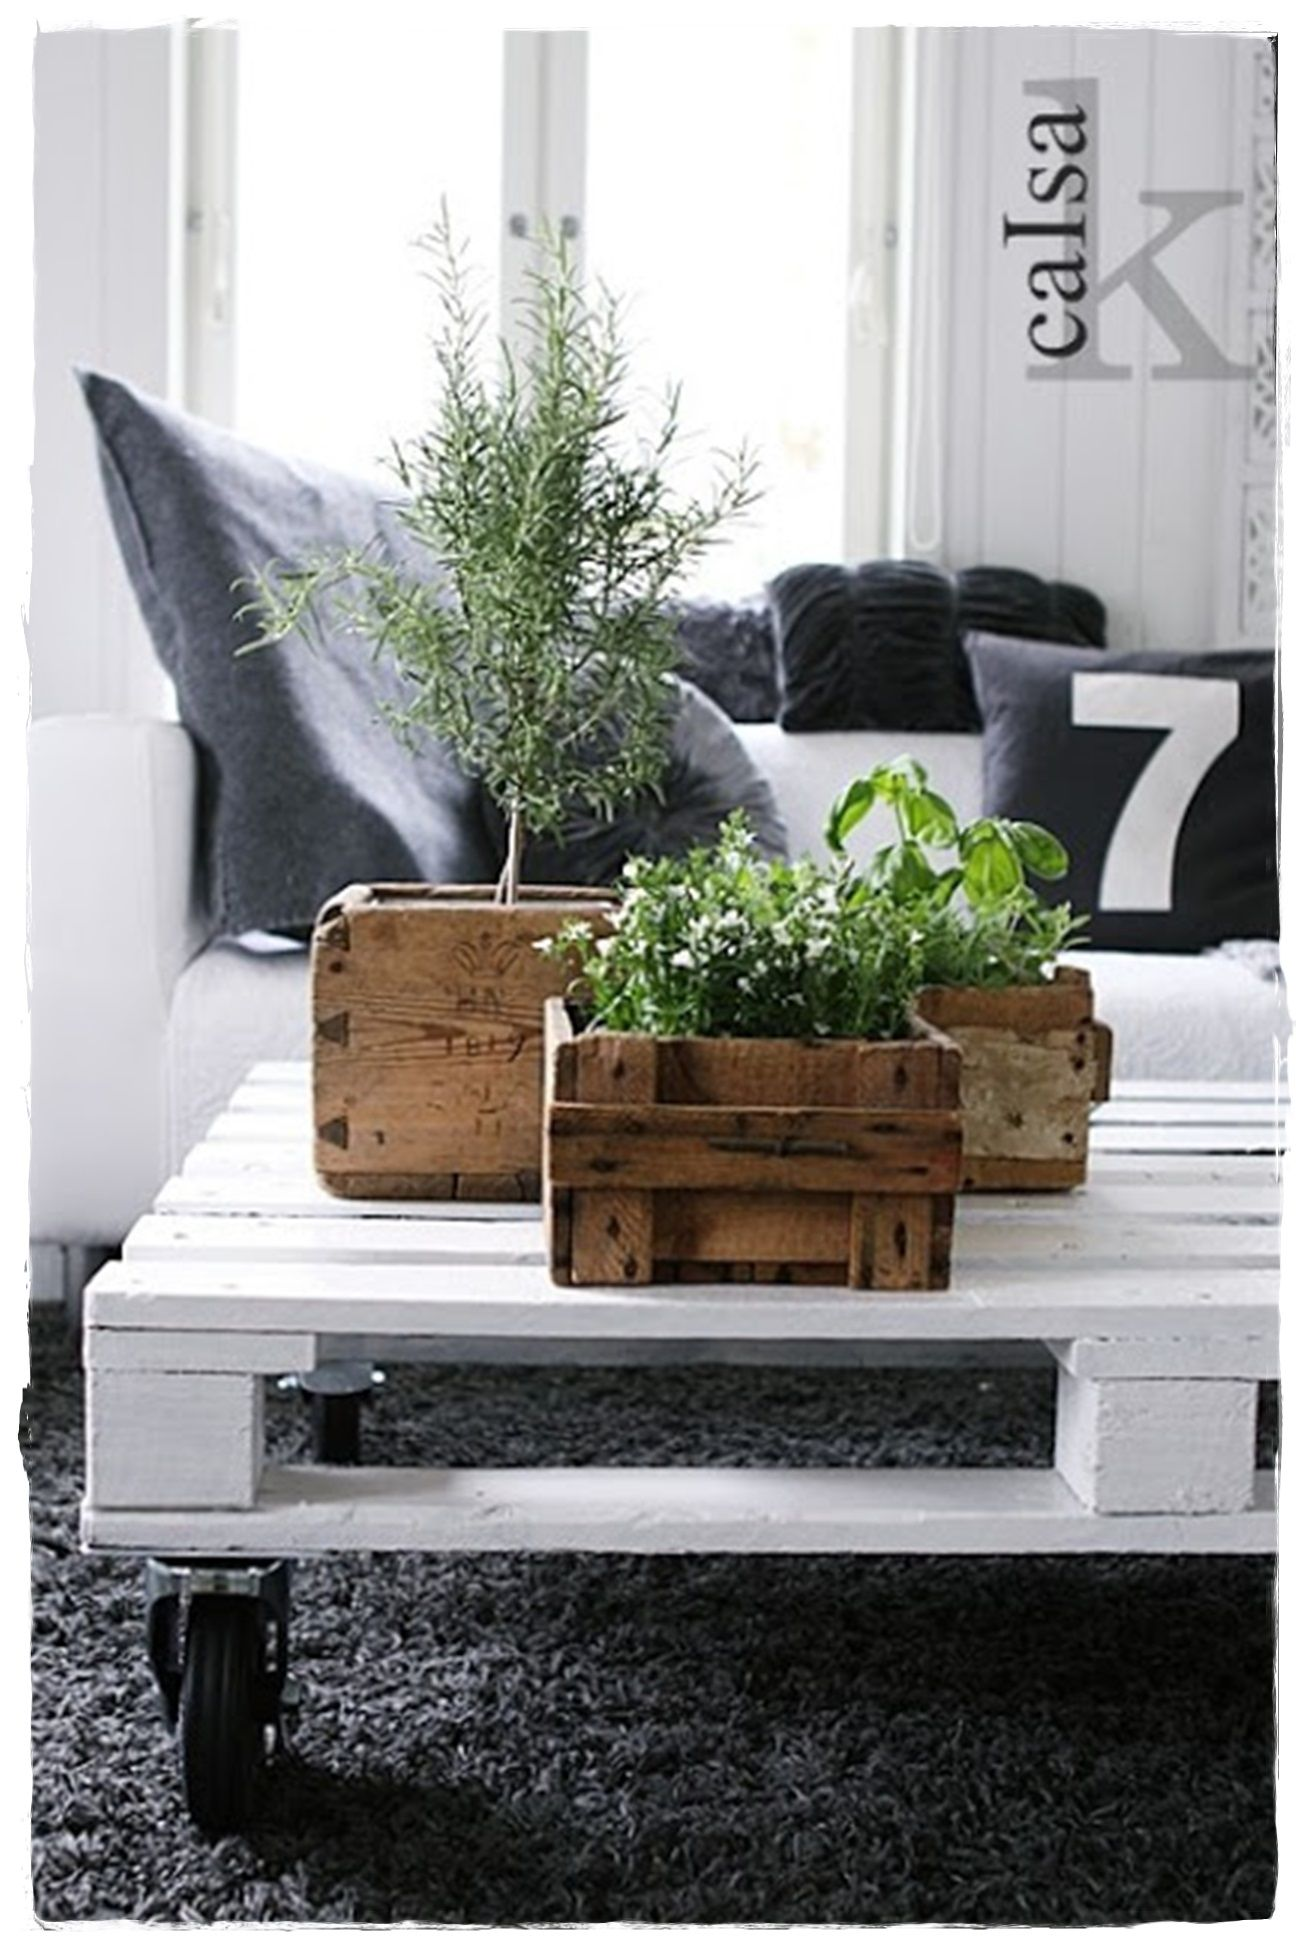 Decoraci n cajas madera plantas jardineras macetas - Caja fruta decoracion ...